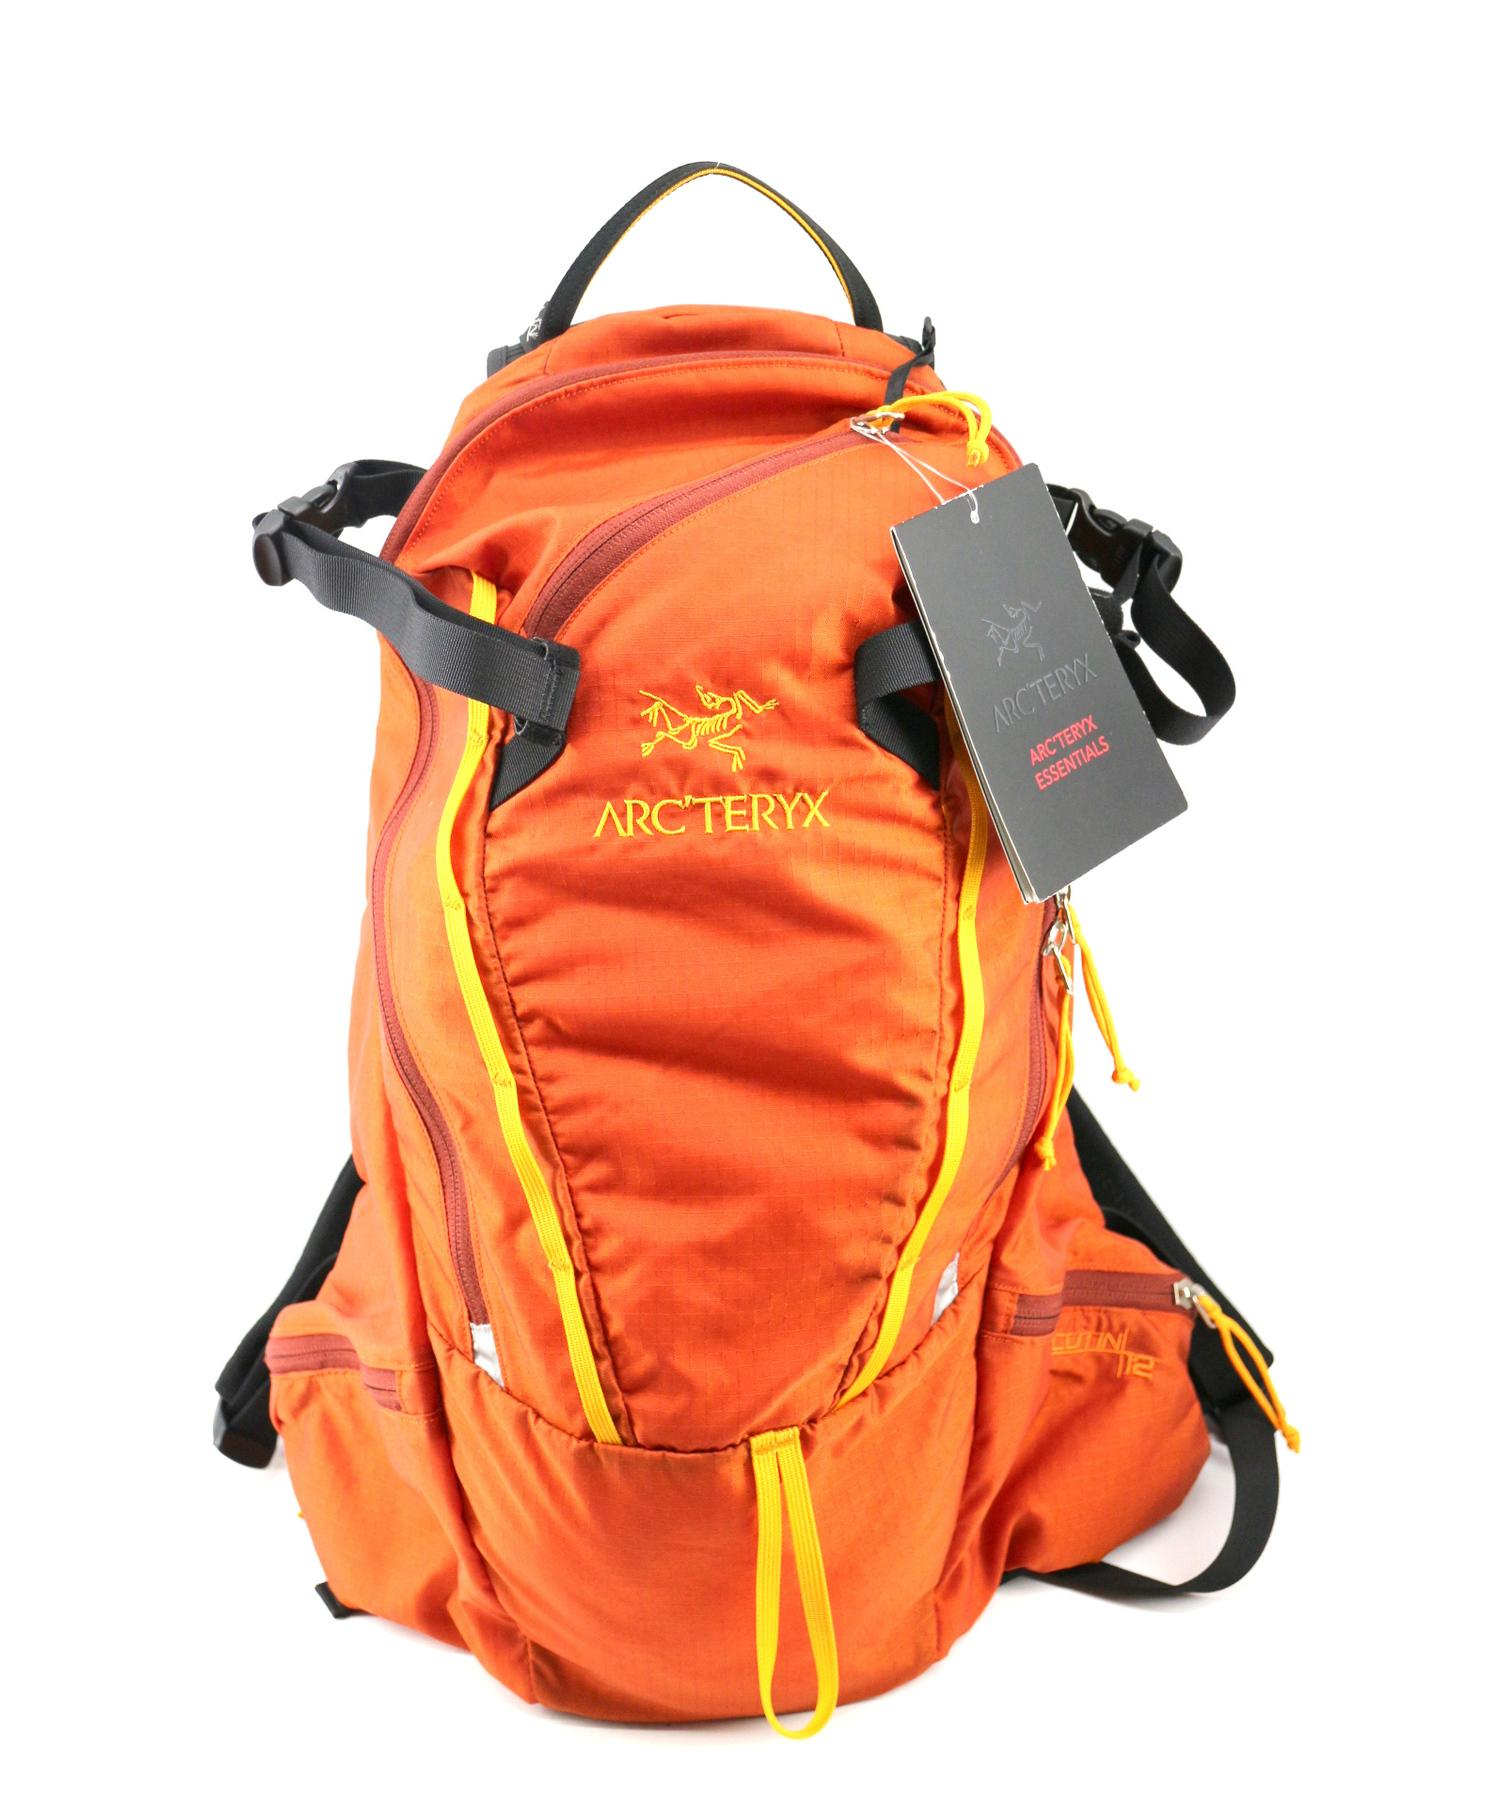 f1617d1479ef ARCTERYX (アークテリクス) バックパック オレンジ Chilcotin 12